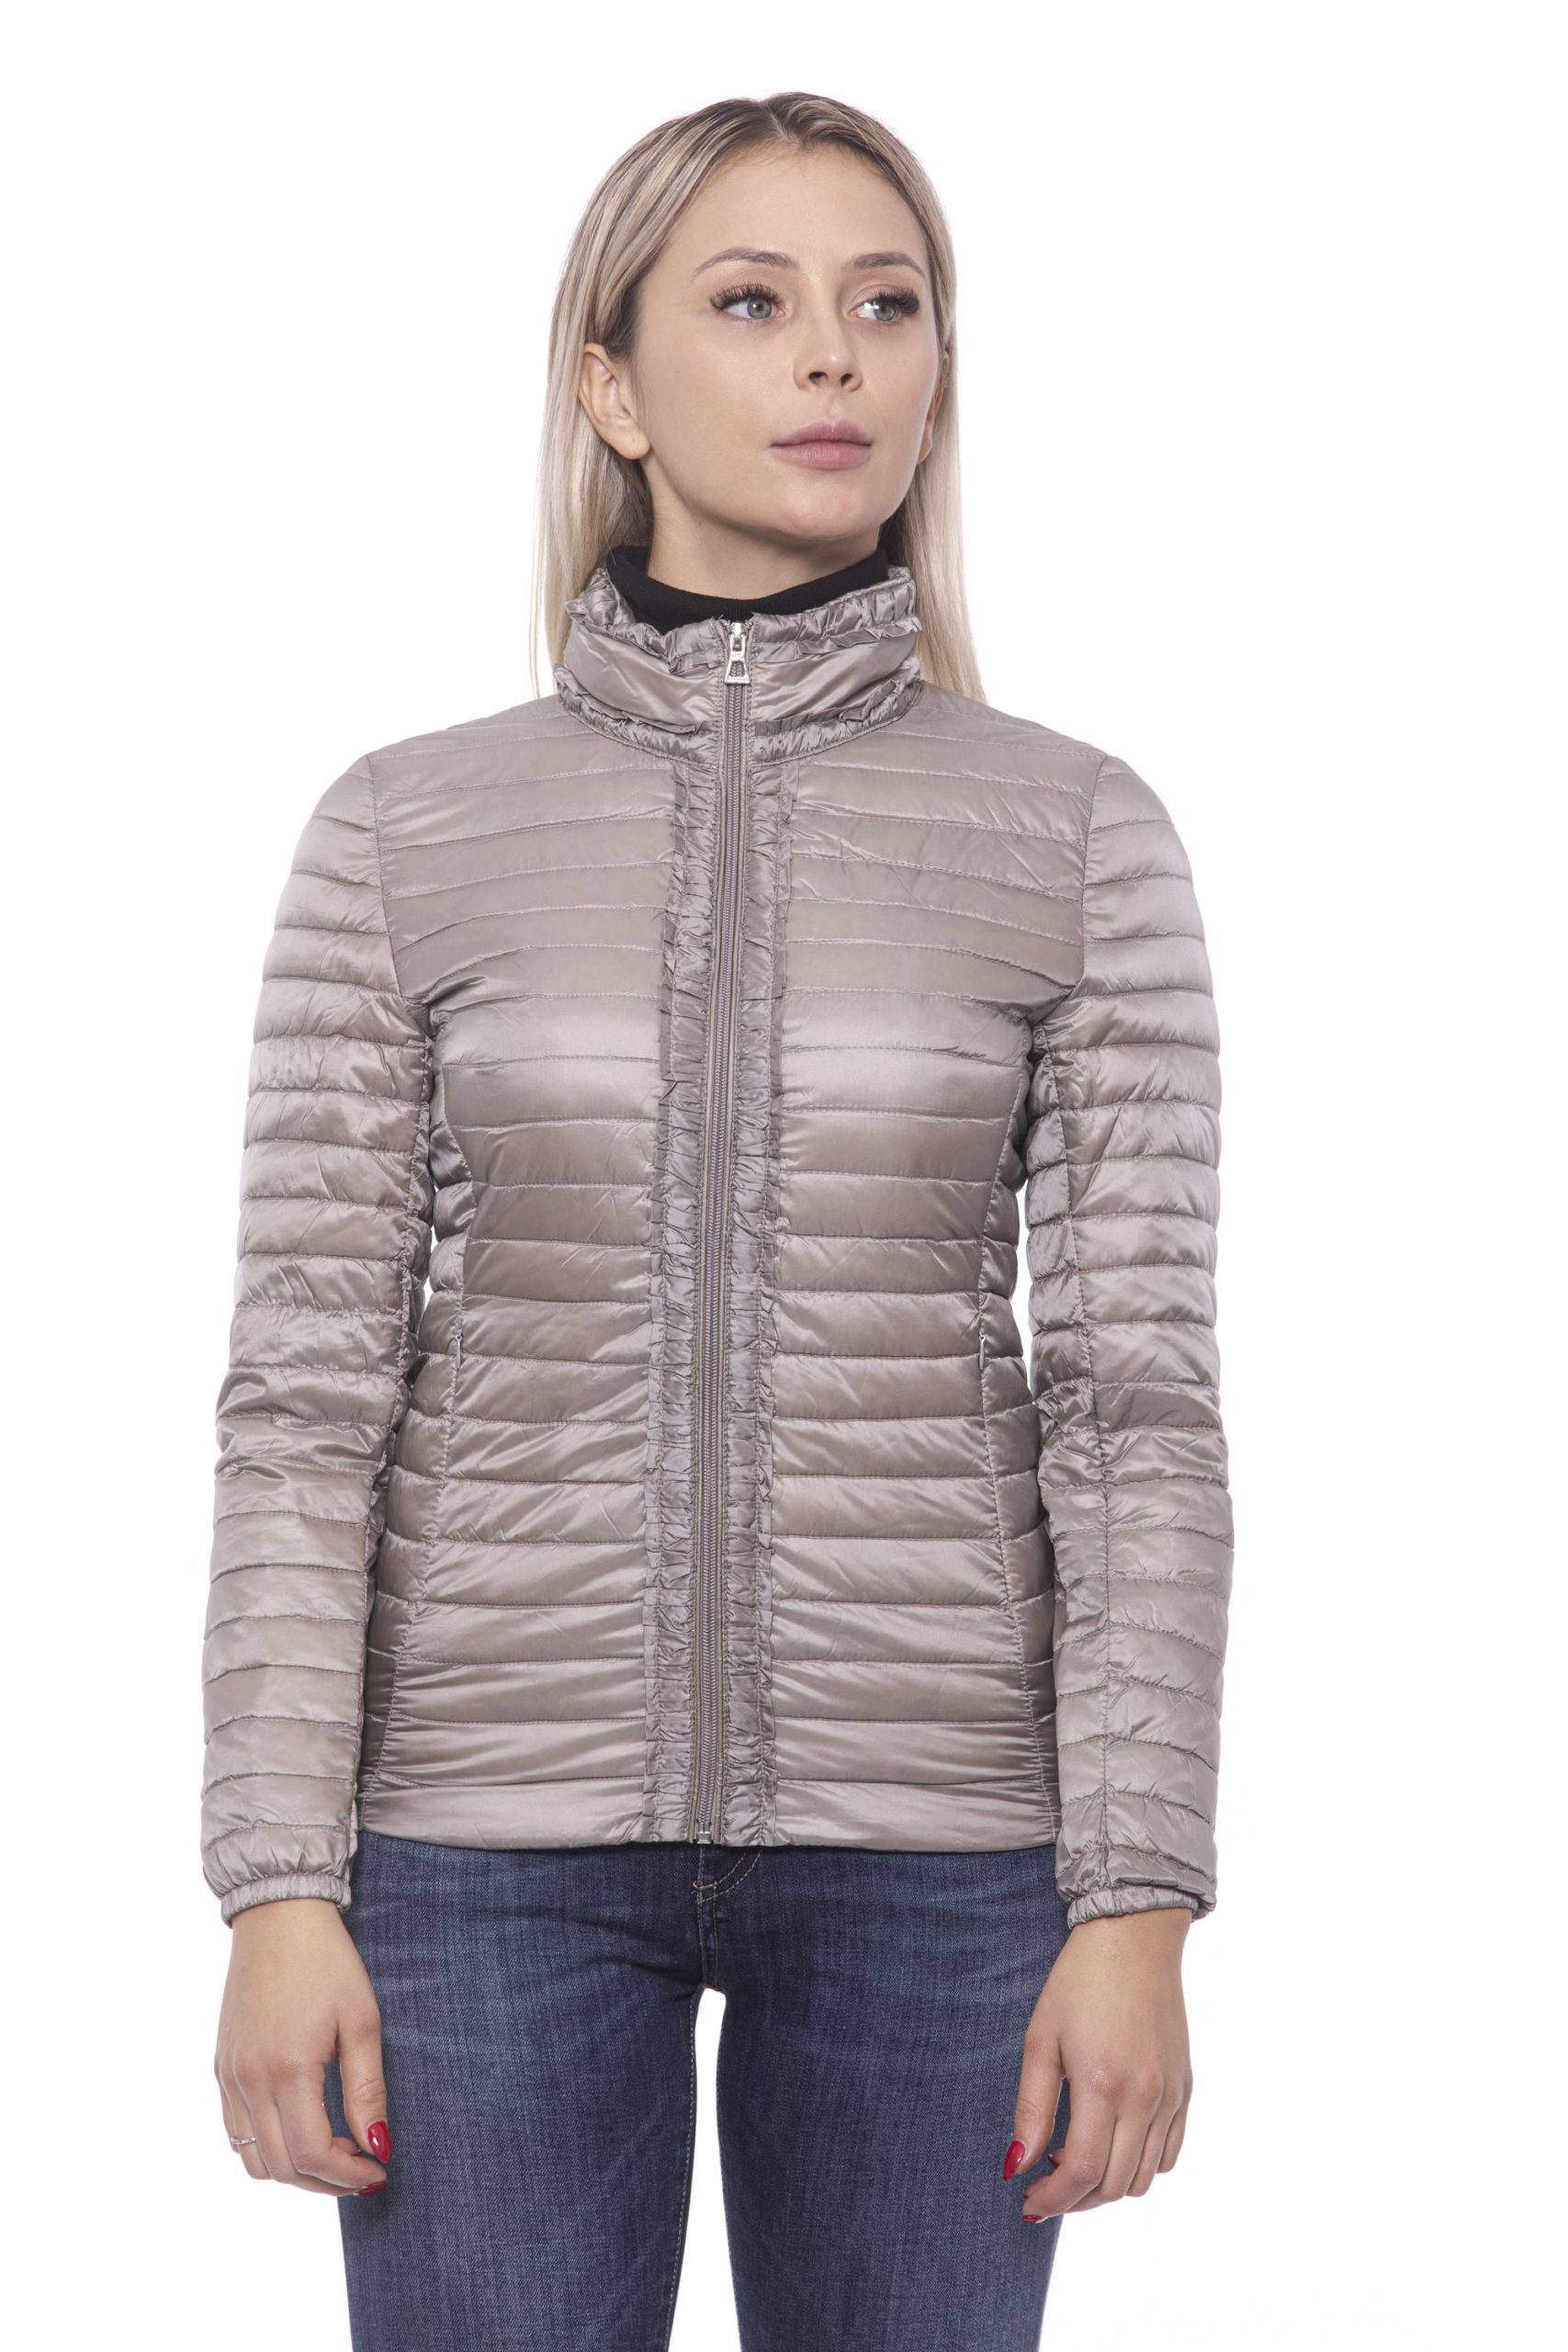 19V69 Italia Women's Jacket Beige 191388311 - S